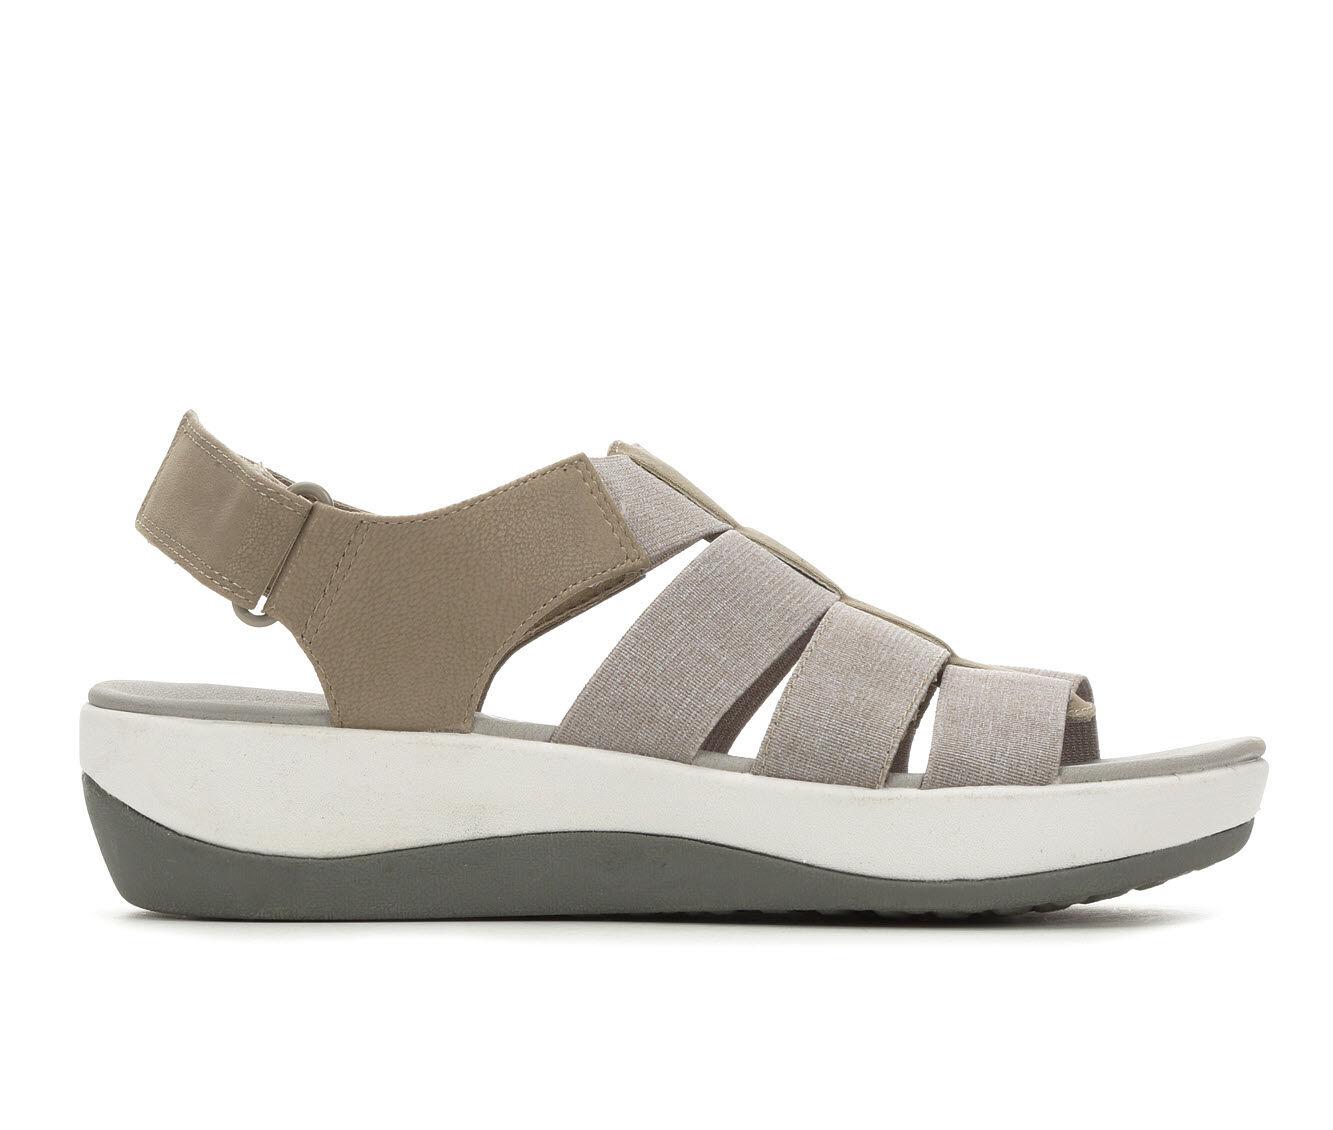 Women's Clarks Arla Shaylie Sandals Sand